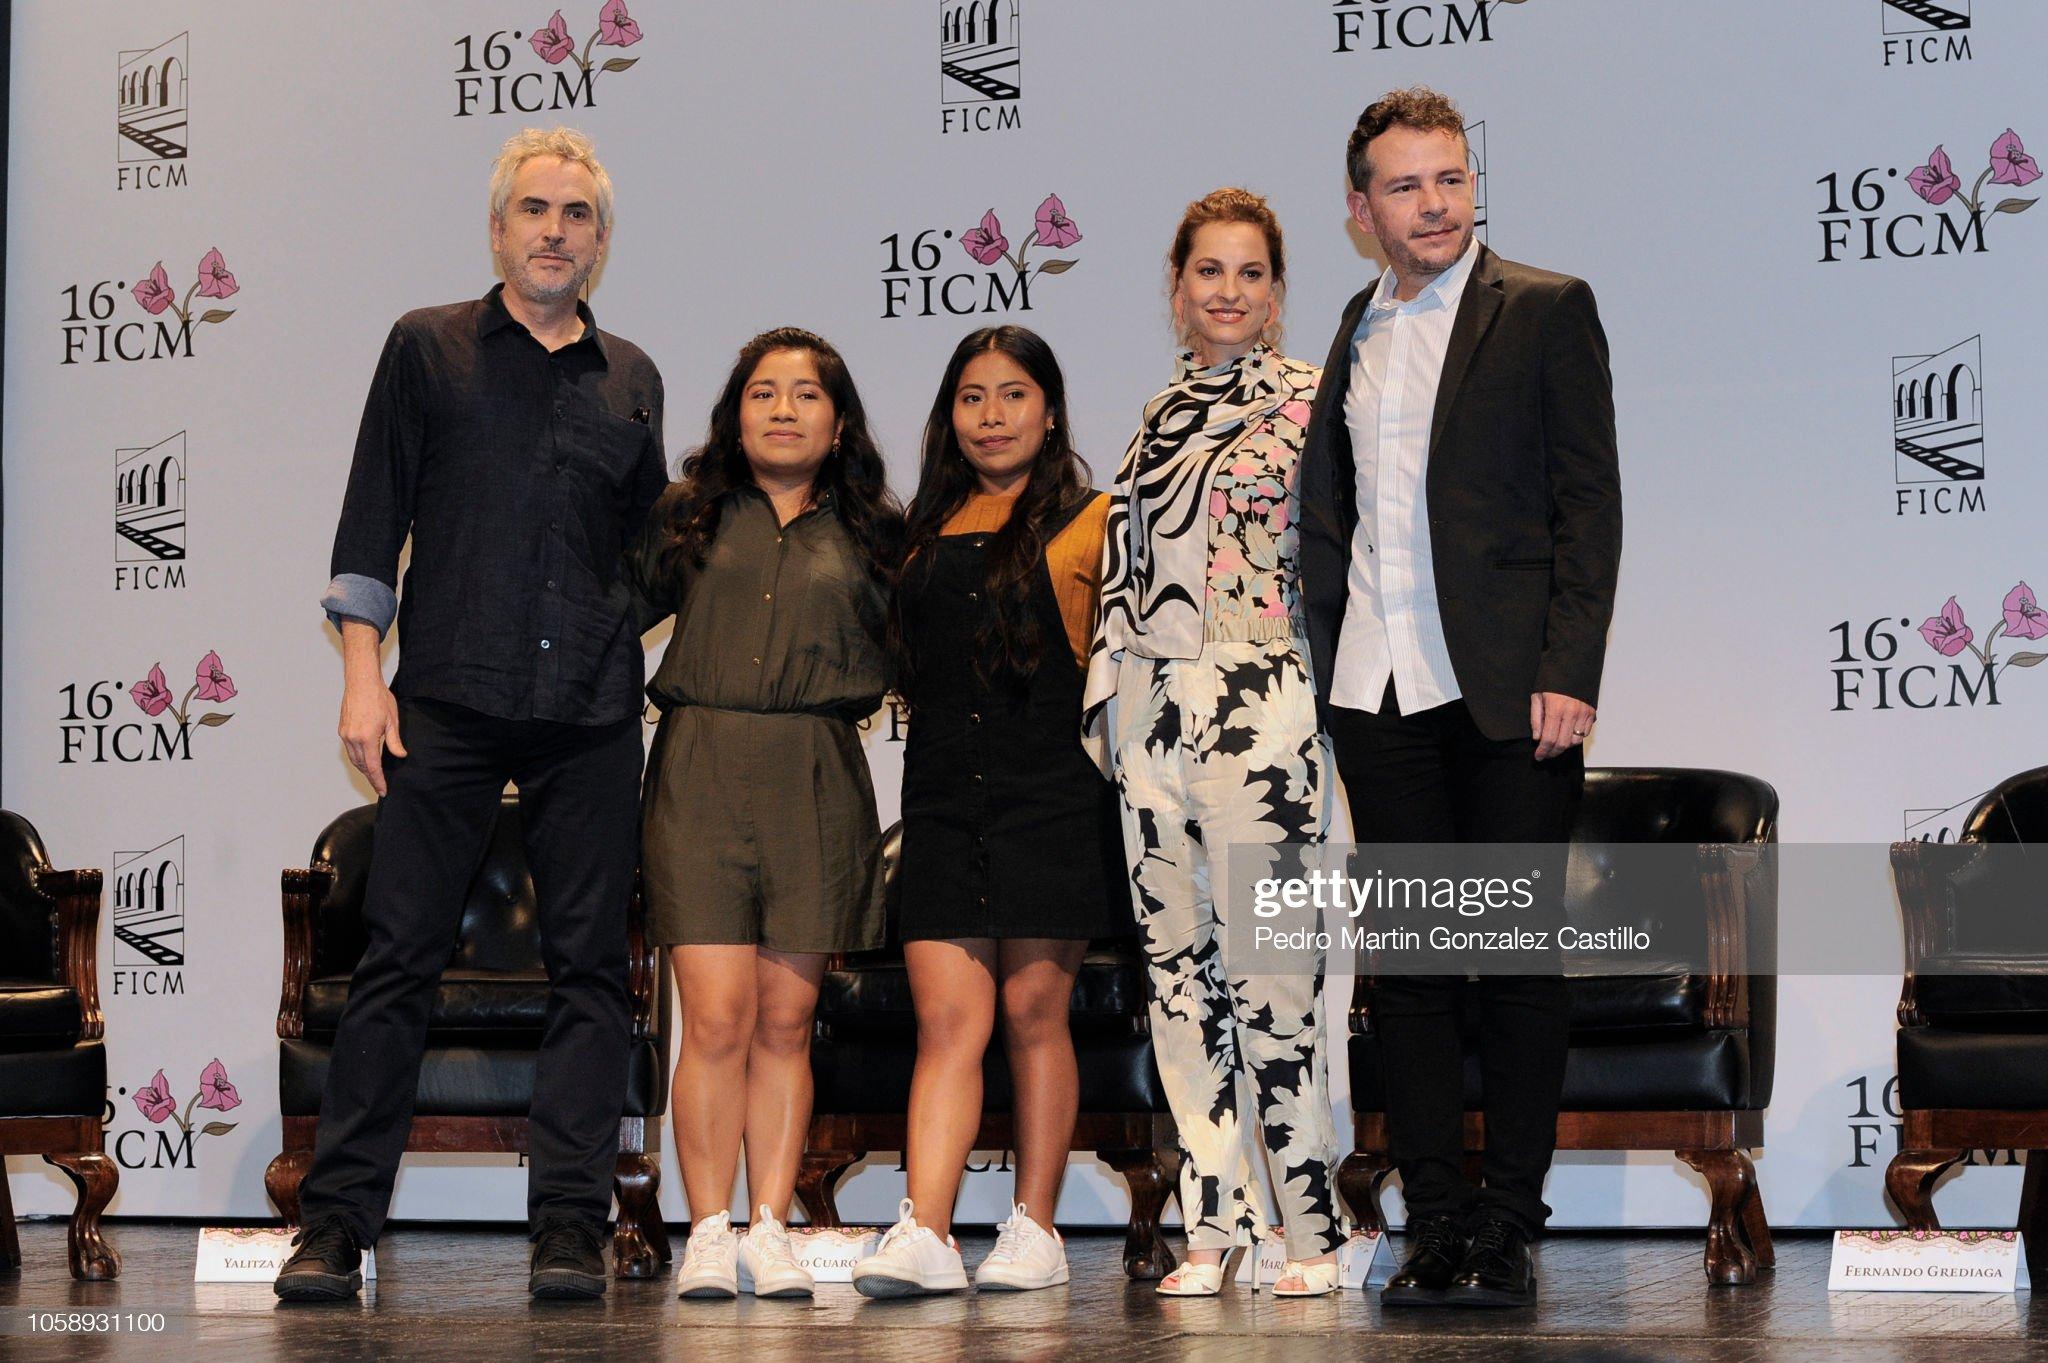 ¿Cuánto mide Nancy García? - Altura - Real height Alfonso-cuarn-nancy-garcia-yalitza-aparicio-marina-de-tavira-and-picture-id1058931100?s=2048x2048